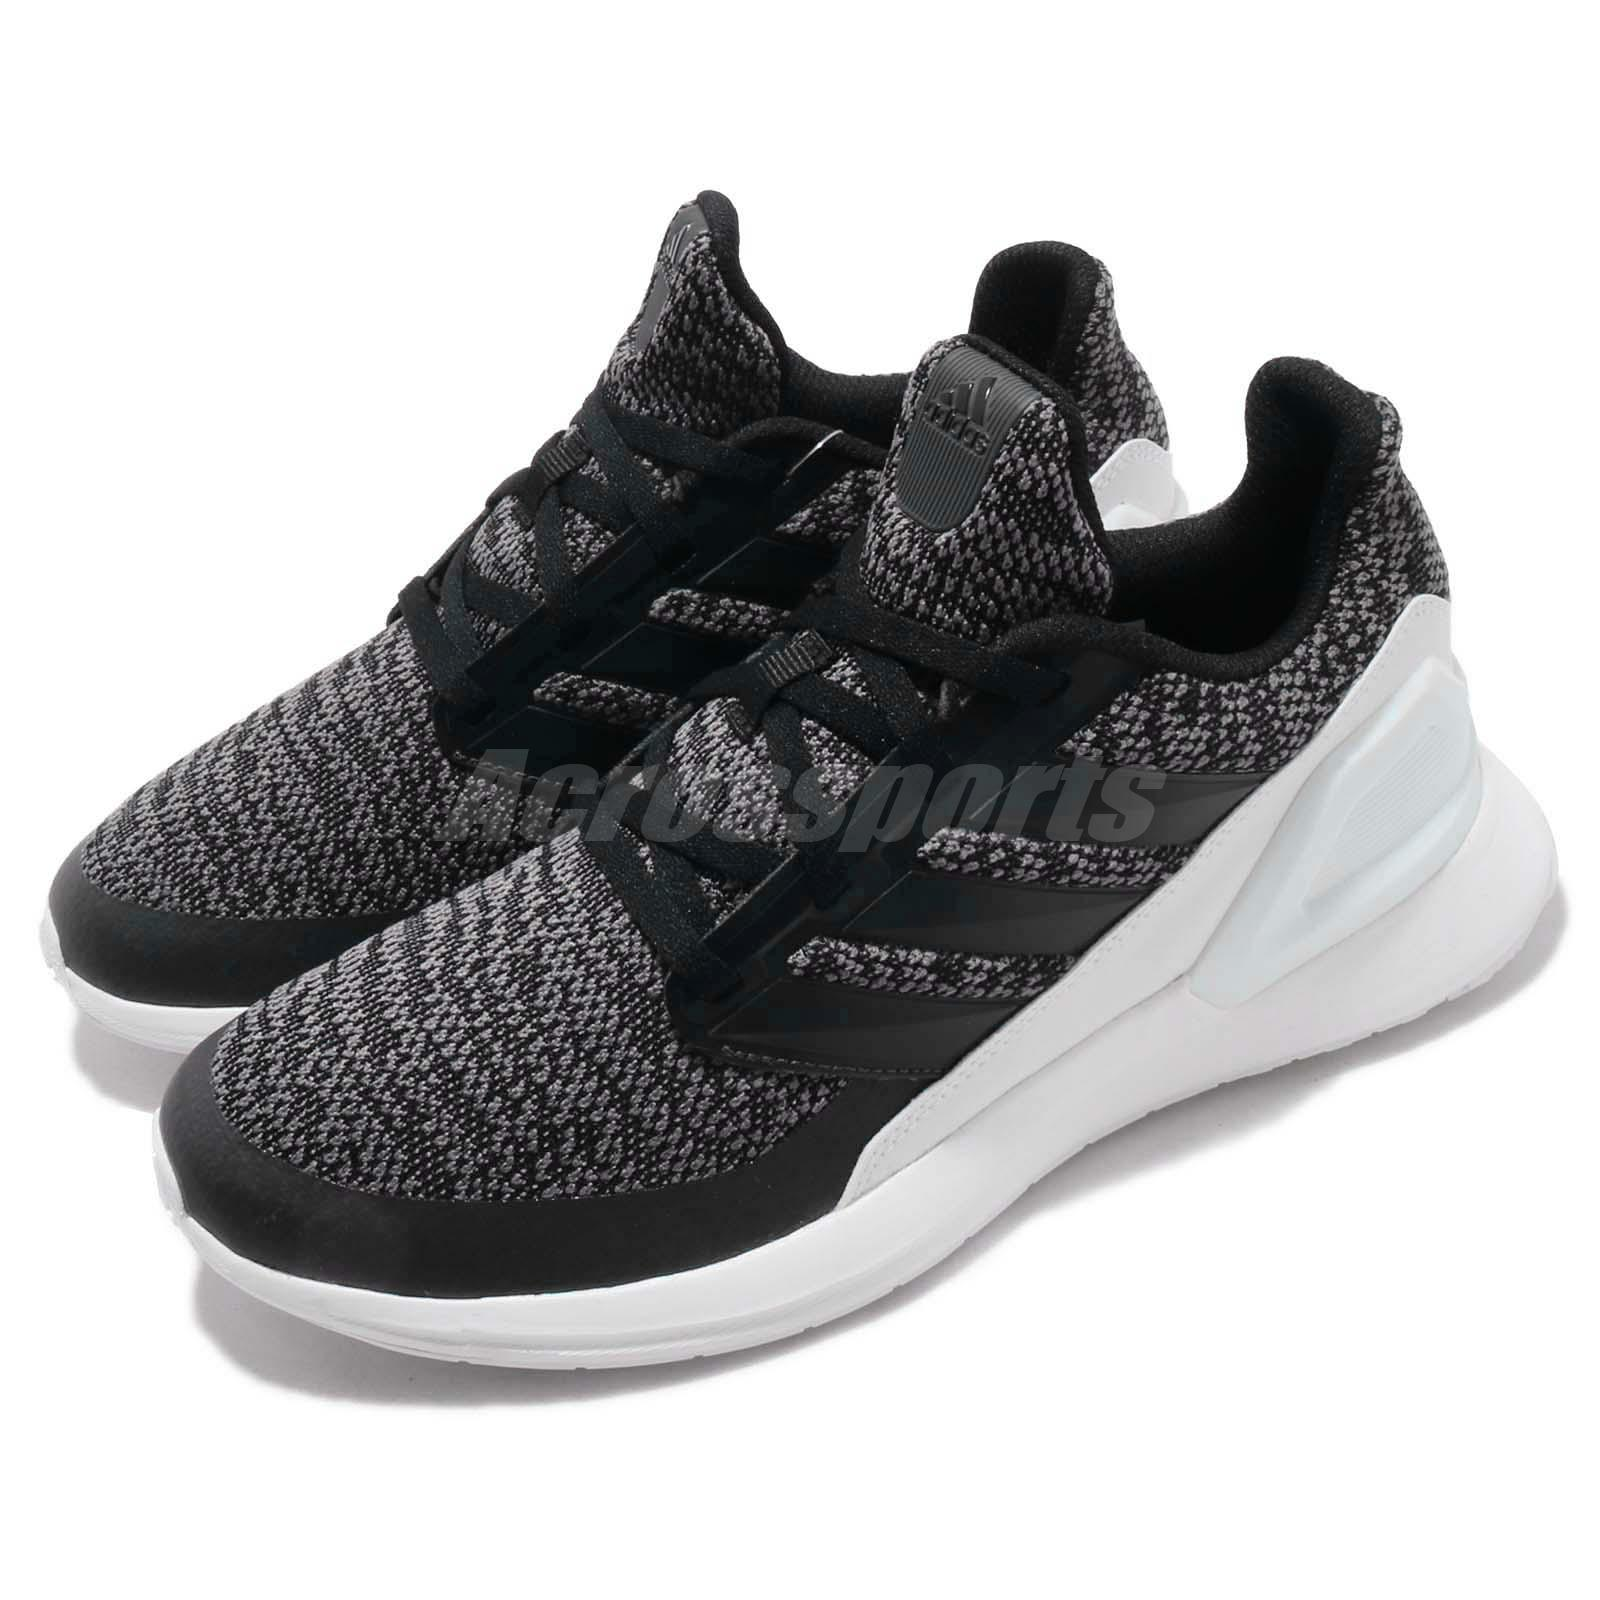 Adidas rapidarun Knit J Negro Gris Niño